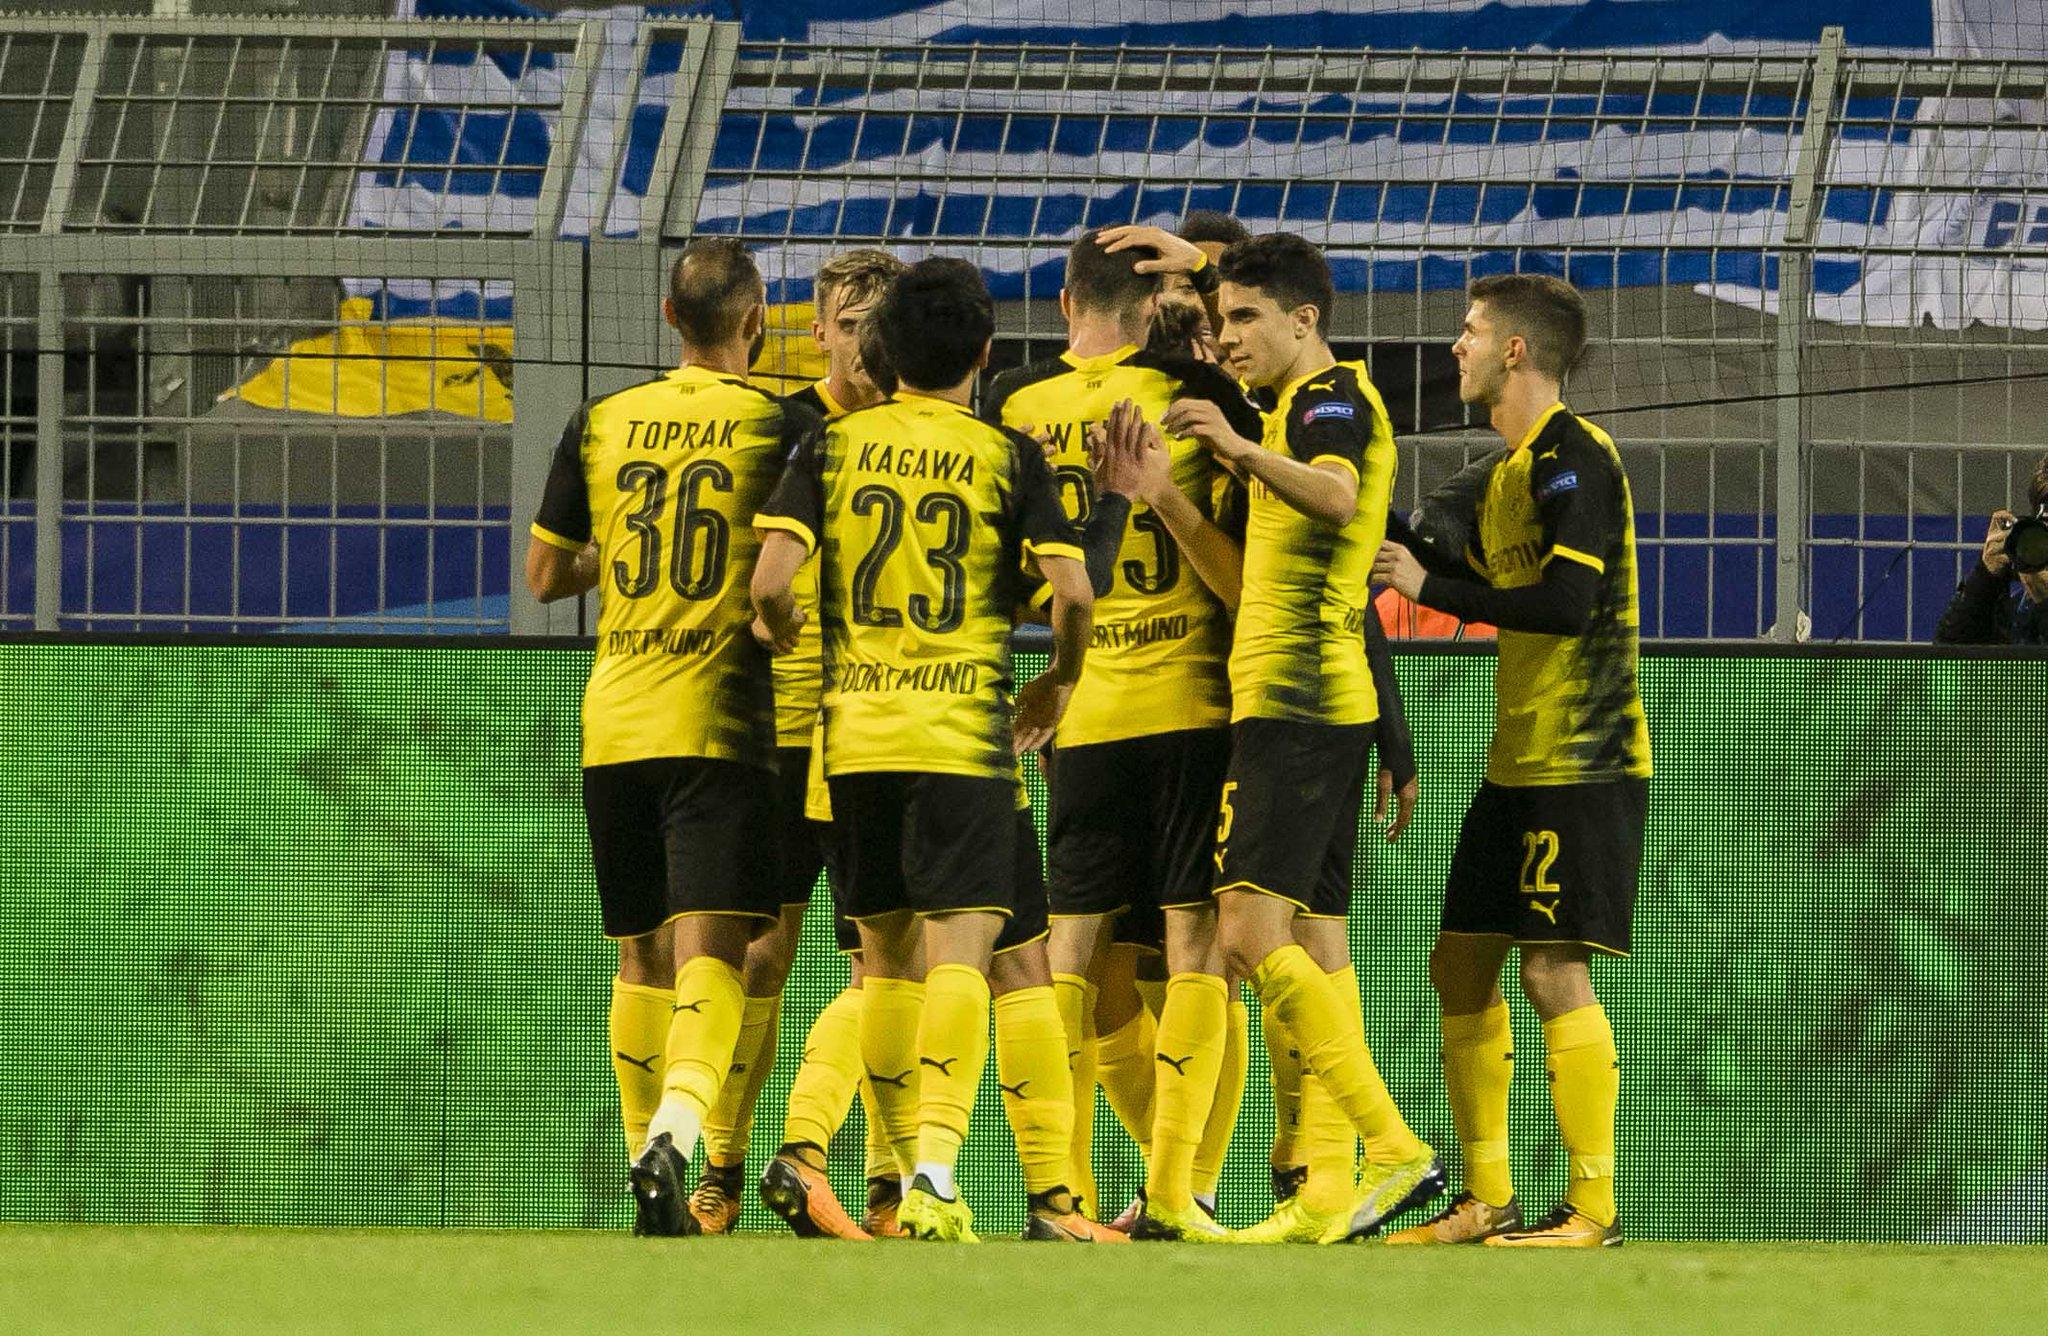 Borussia buscará ganar en casa. Foto: Borussia/Twitter: Borussia Dortmund @BVB